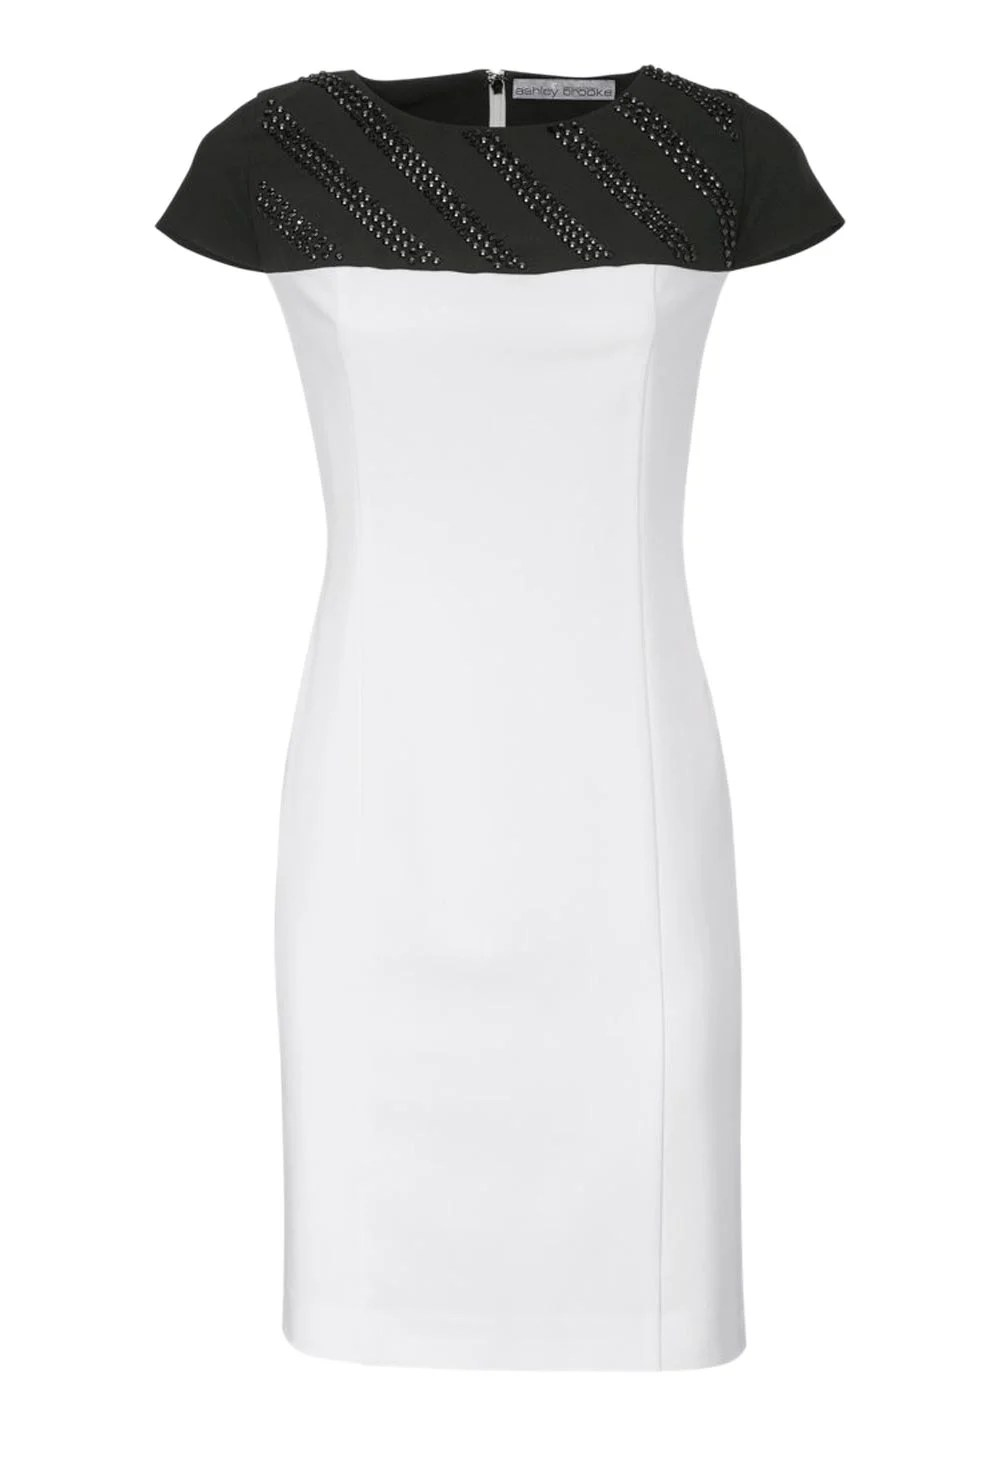 002.698 ASHLEY BROOKE Damen Designer-Patch-Etuikleid Ecru-Schwarz